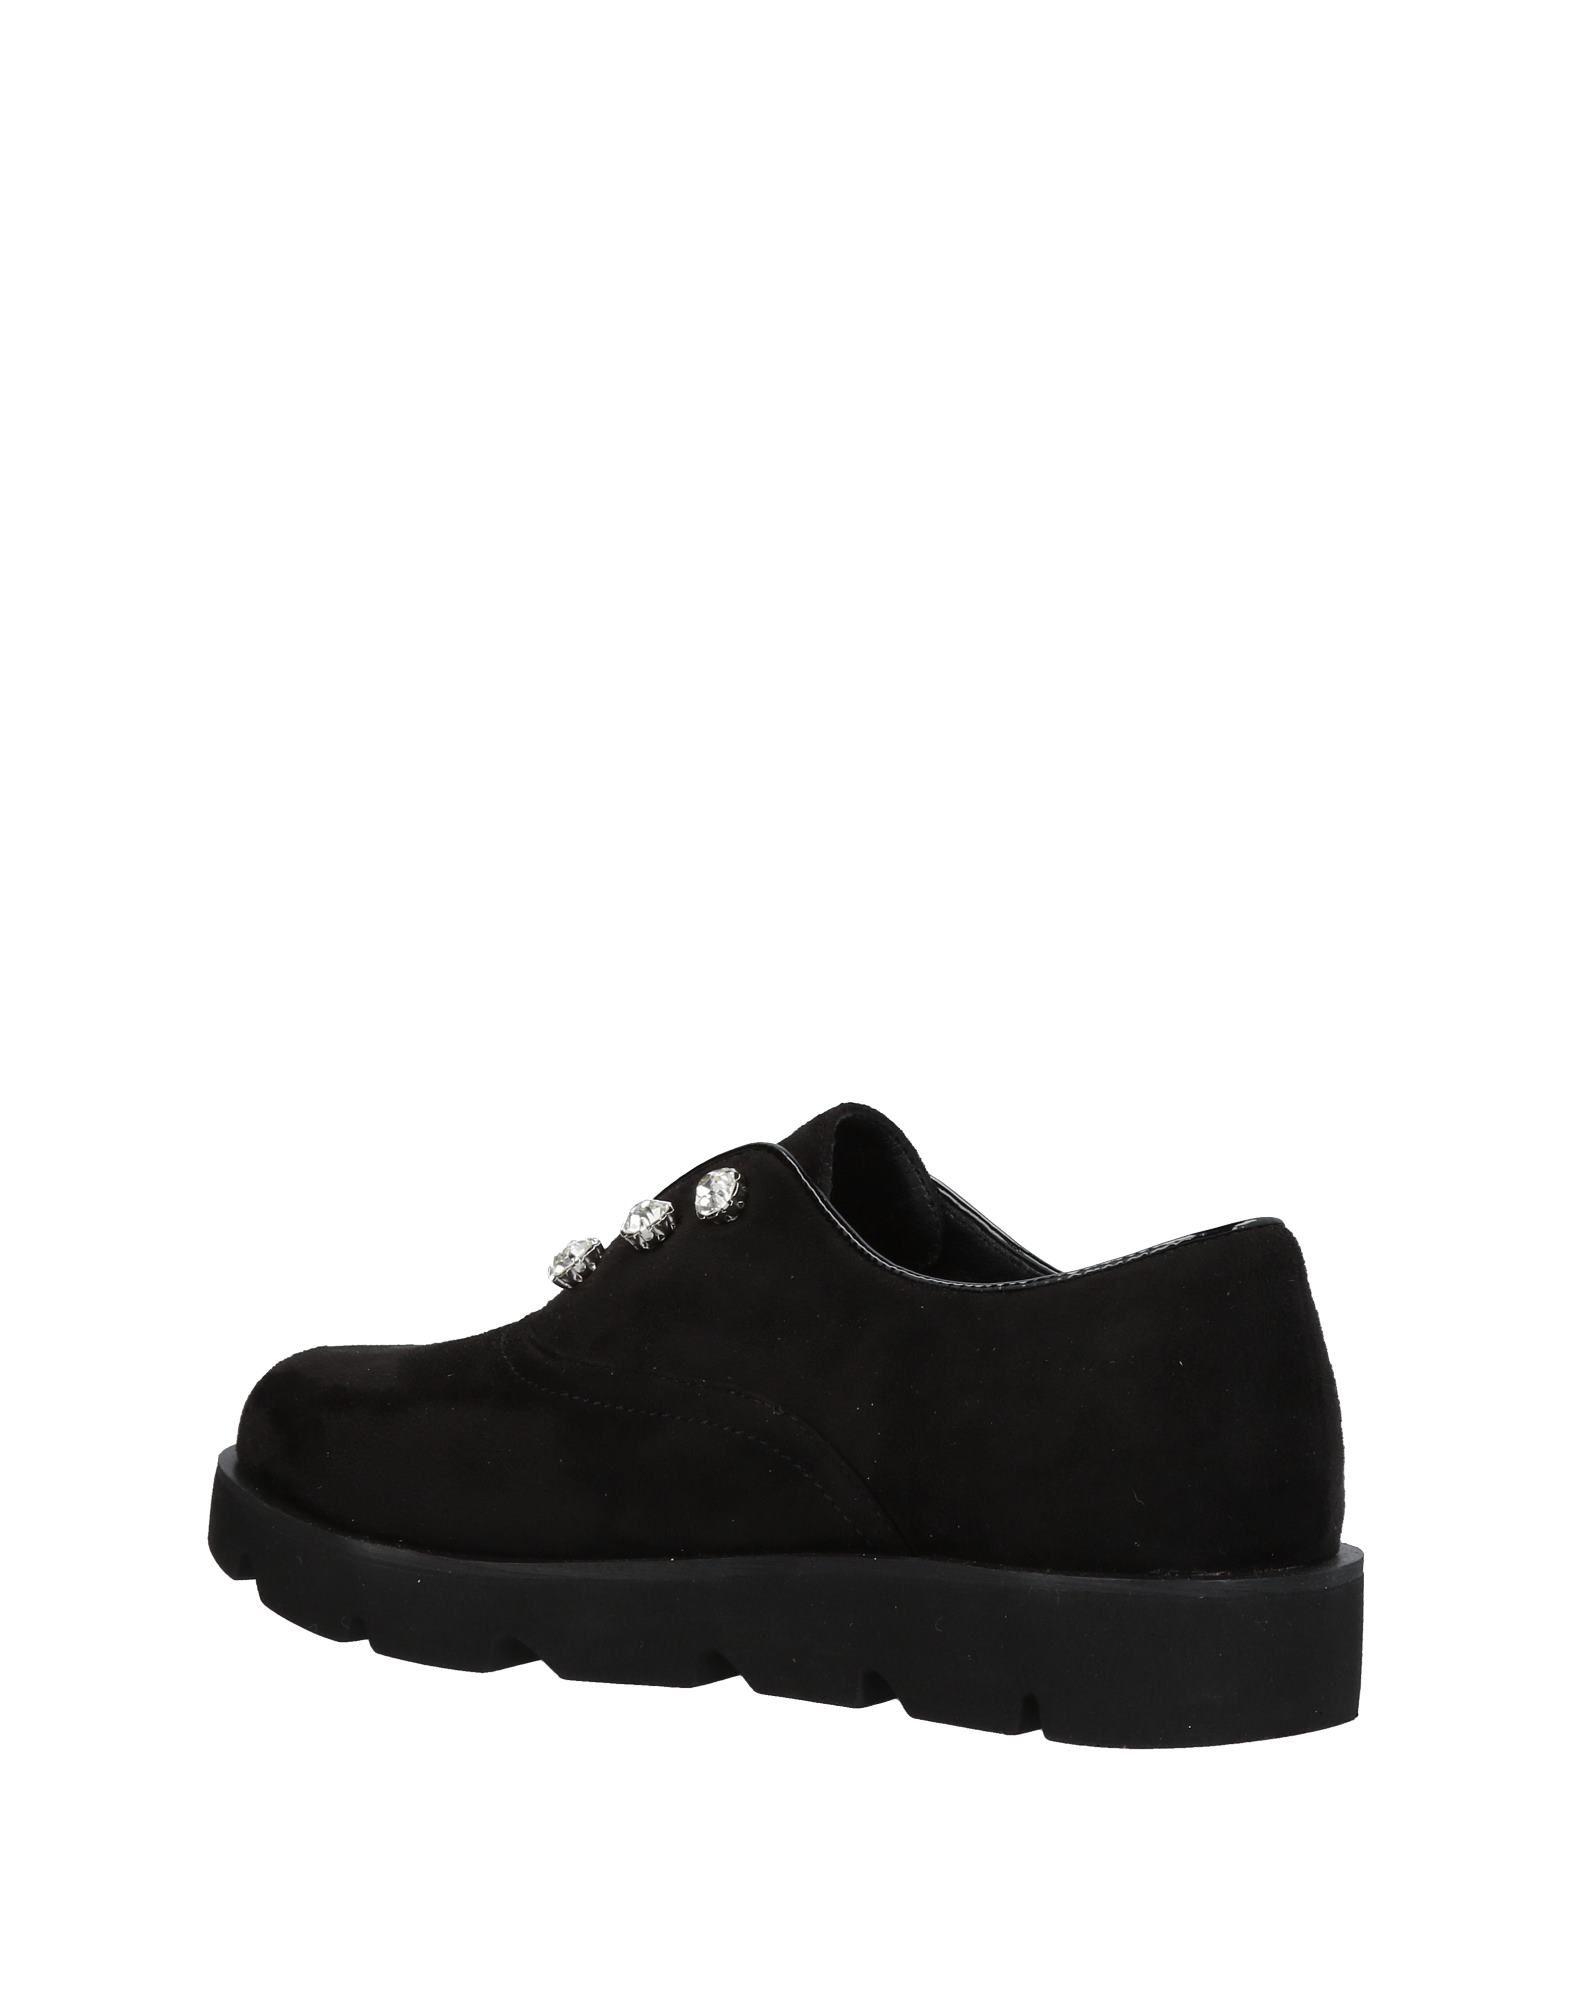 Tua By Braccialini Sneakers Damen  11448768LJ Gute Qualität beliebte Schuhe